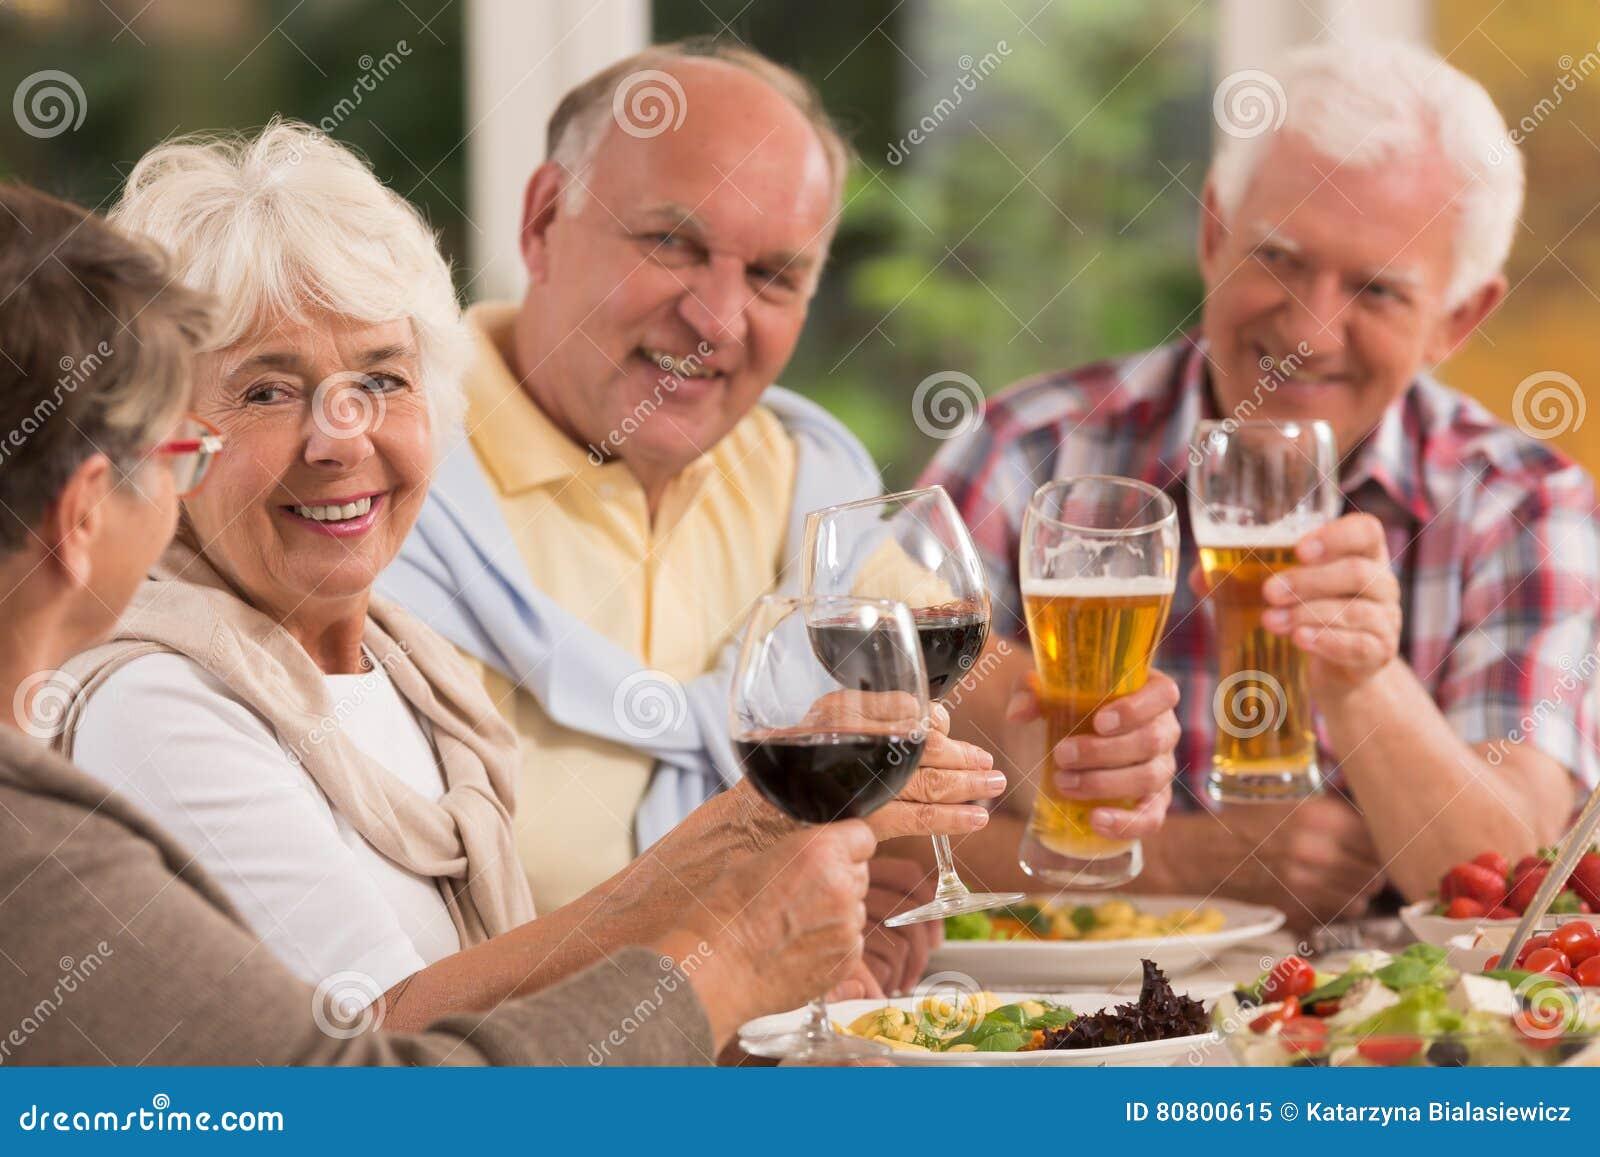 Happy elderly friends drinking beer